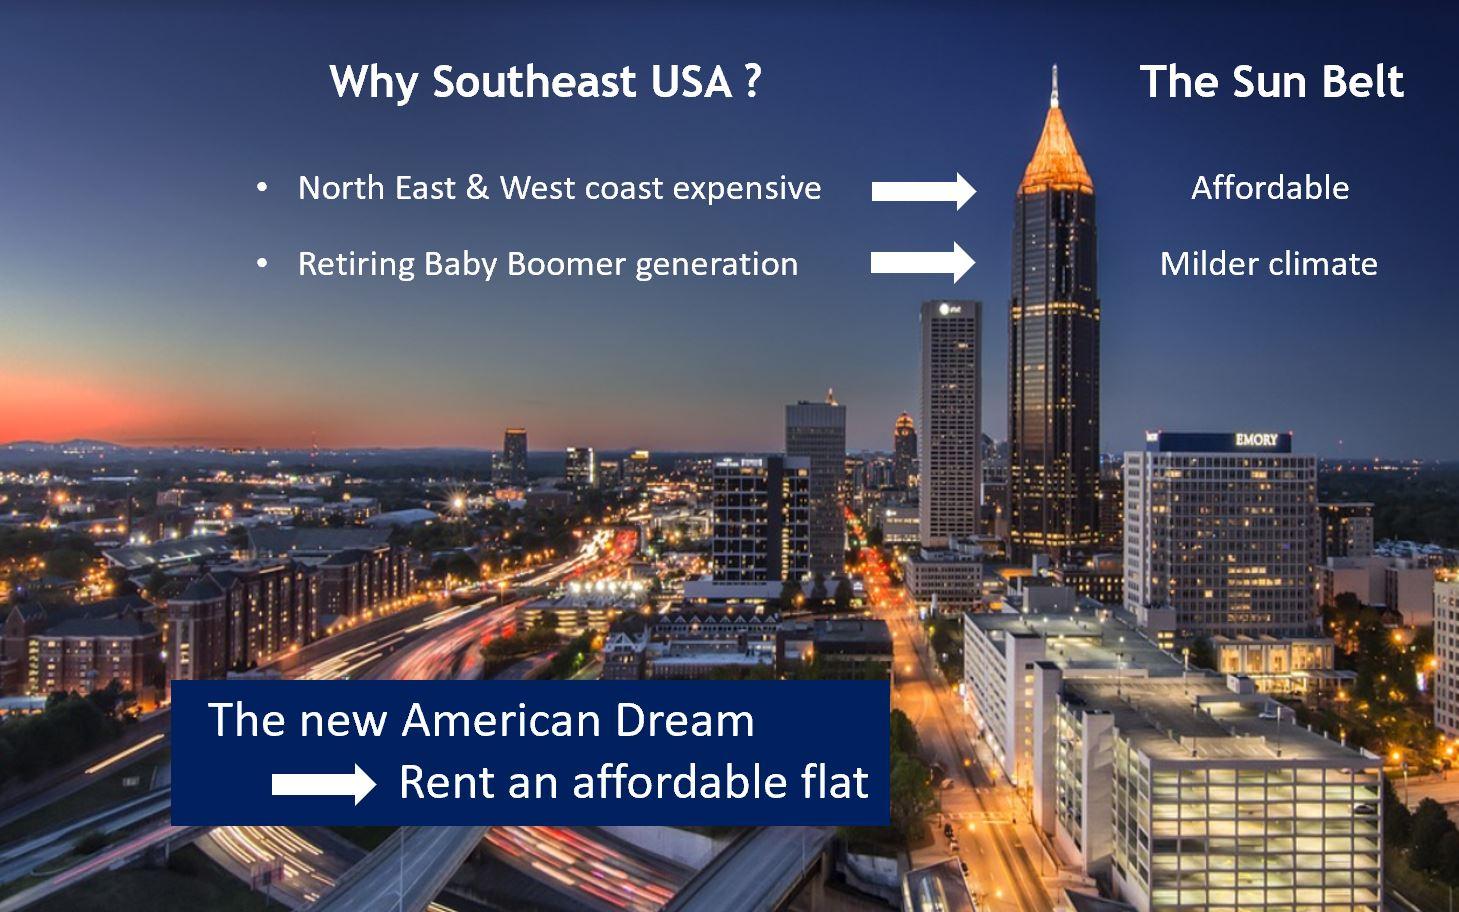 Multi Family Real Estate Bond - The Sun Belt - USA - Atlanta